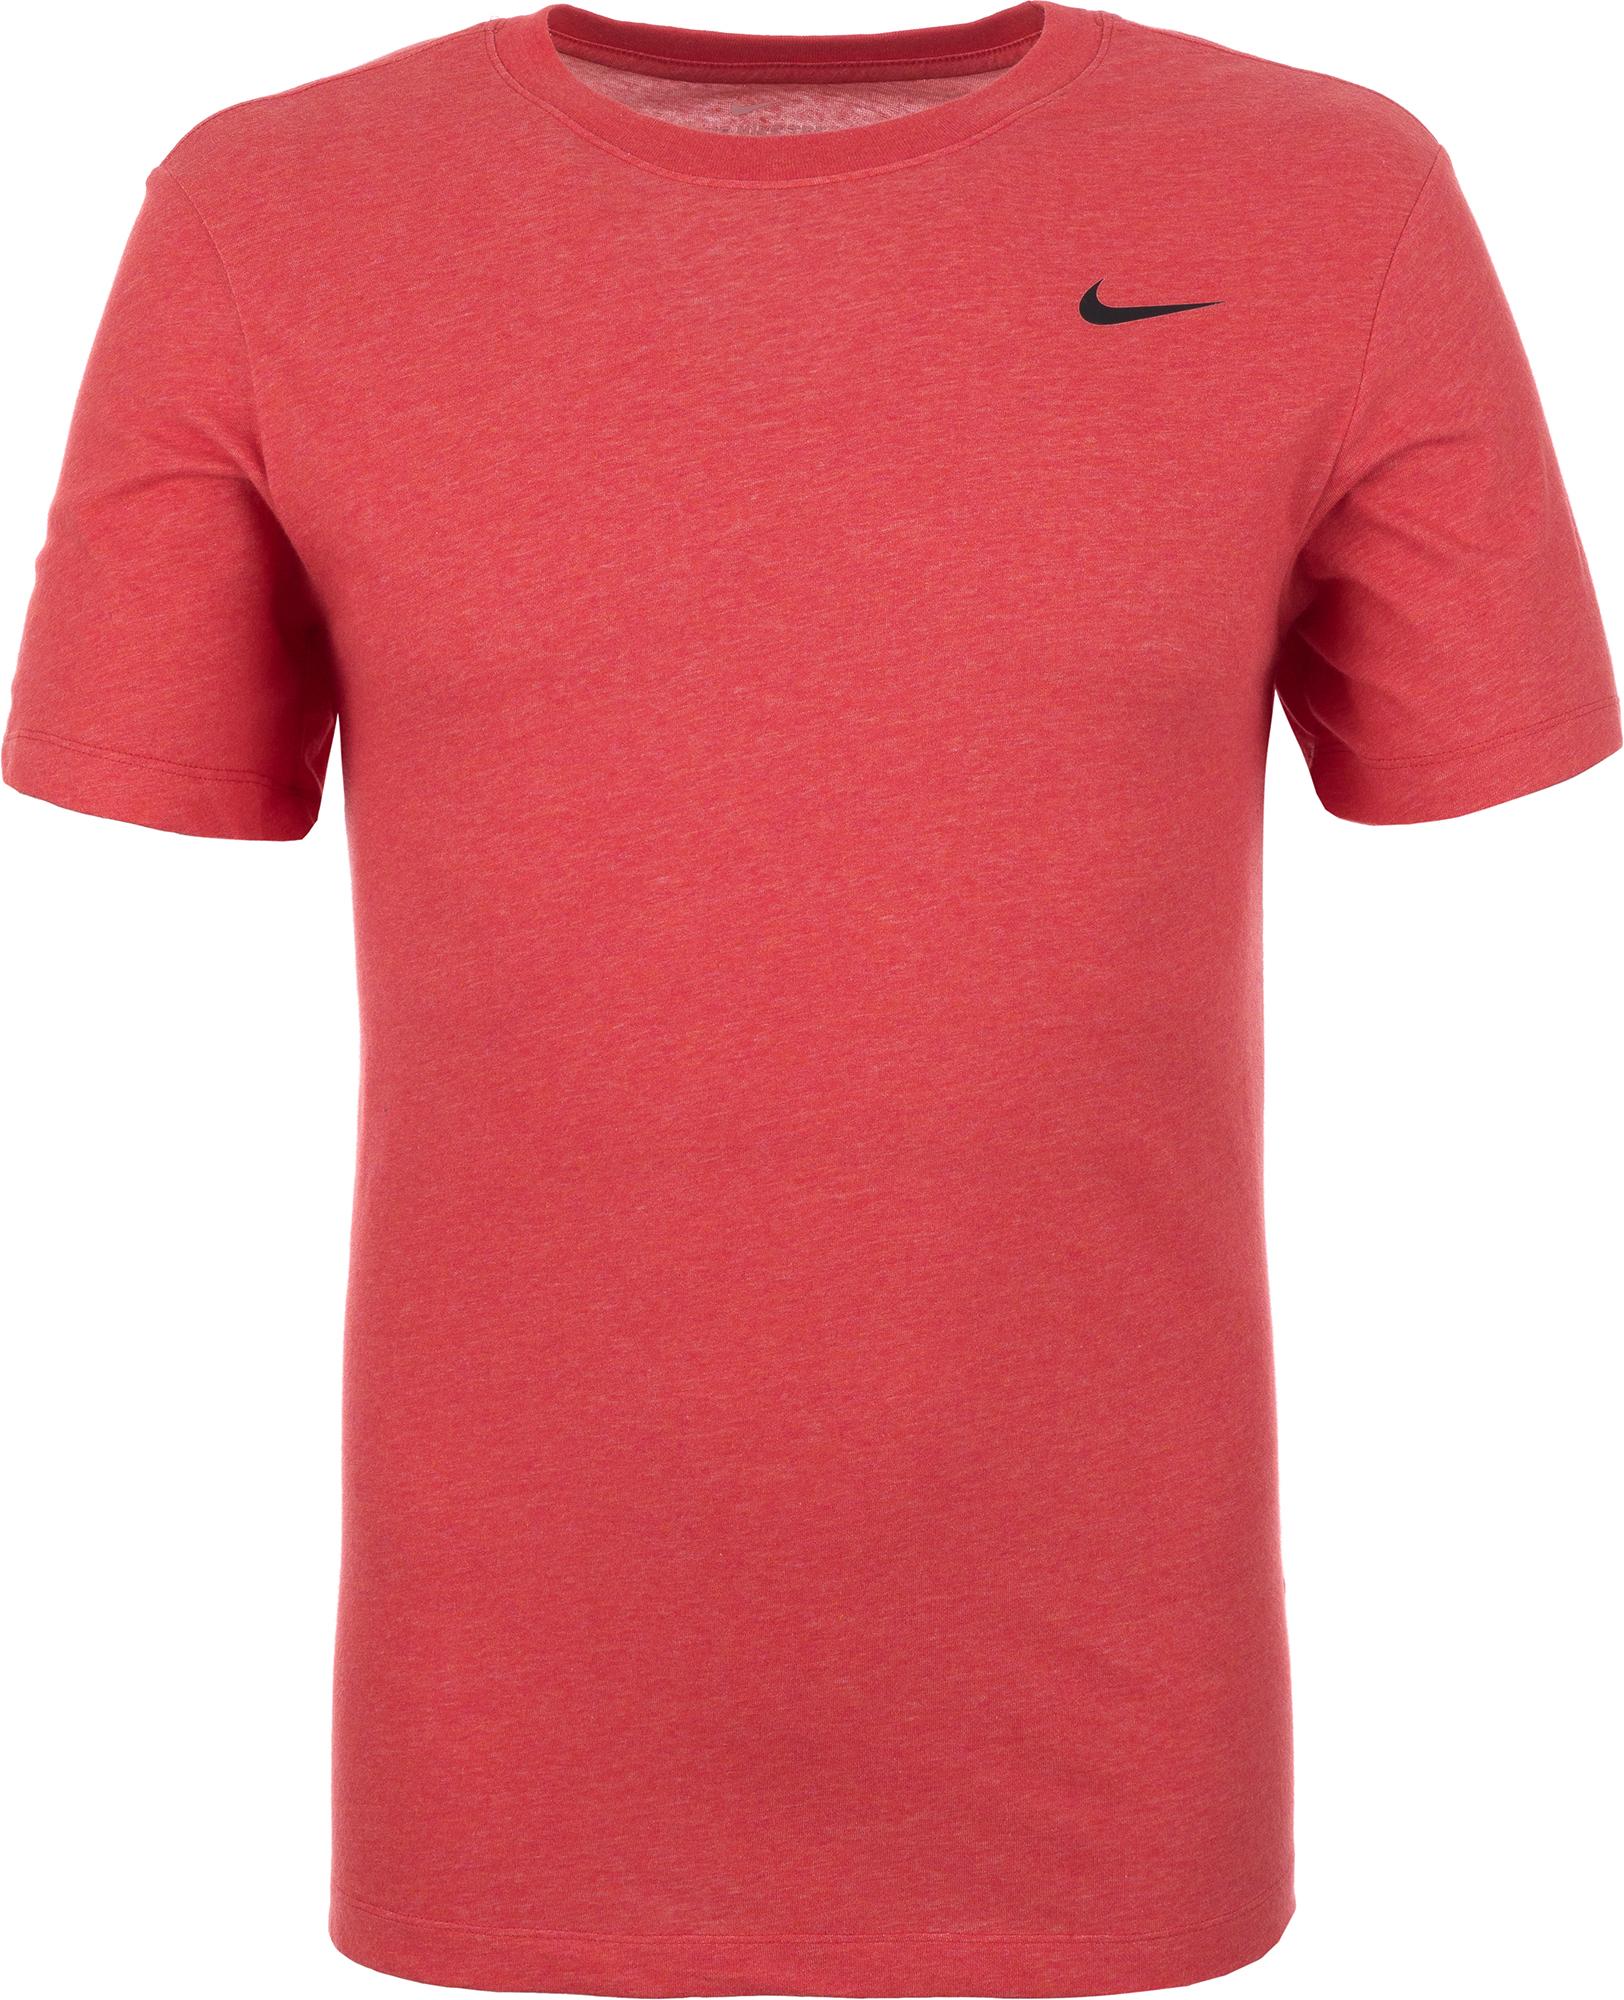 Nike Футболка мужская Nike Dri-FIT, размер 44-46